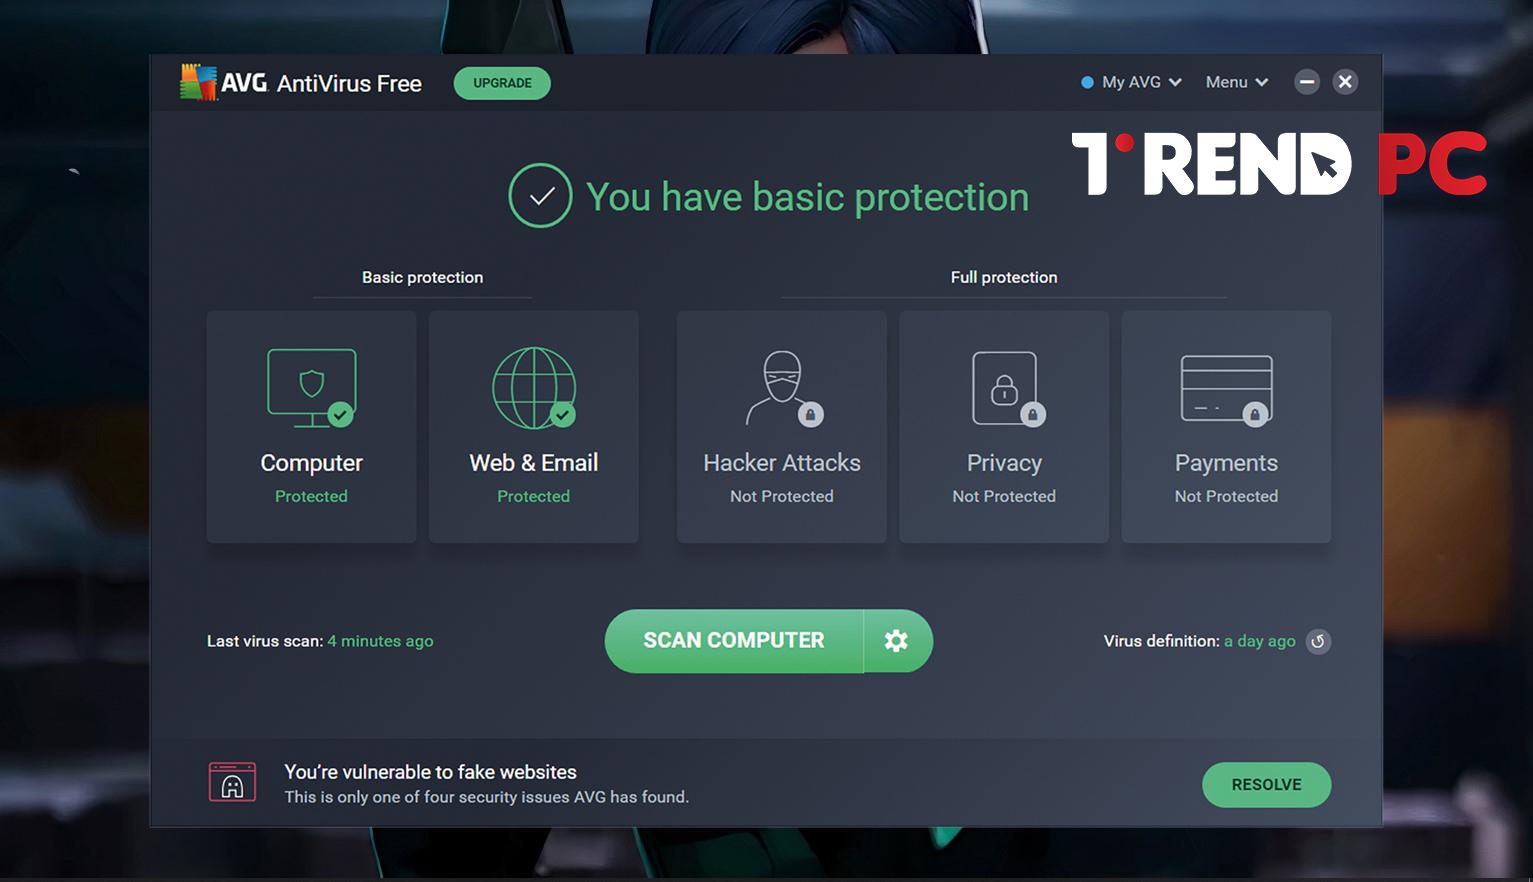 برنامج AVG Antivirus Free